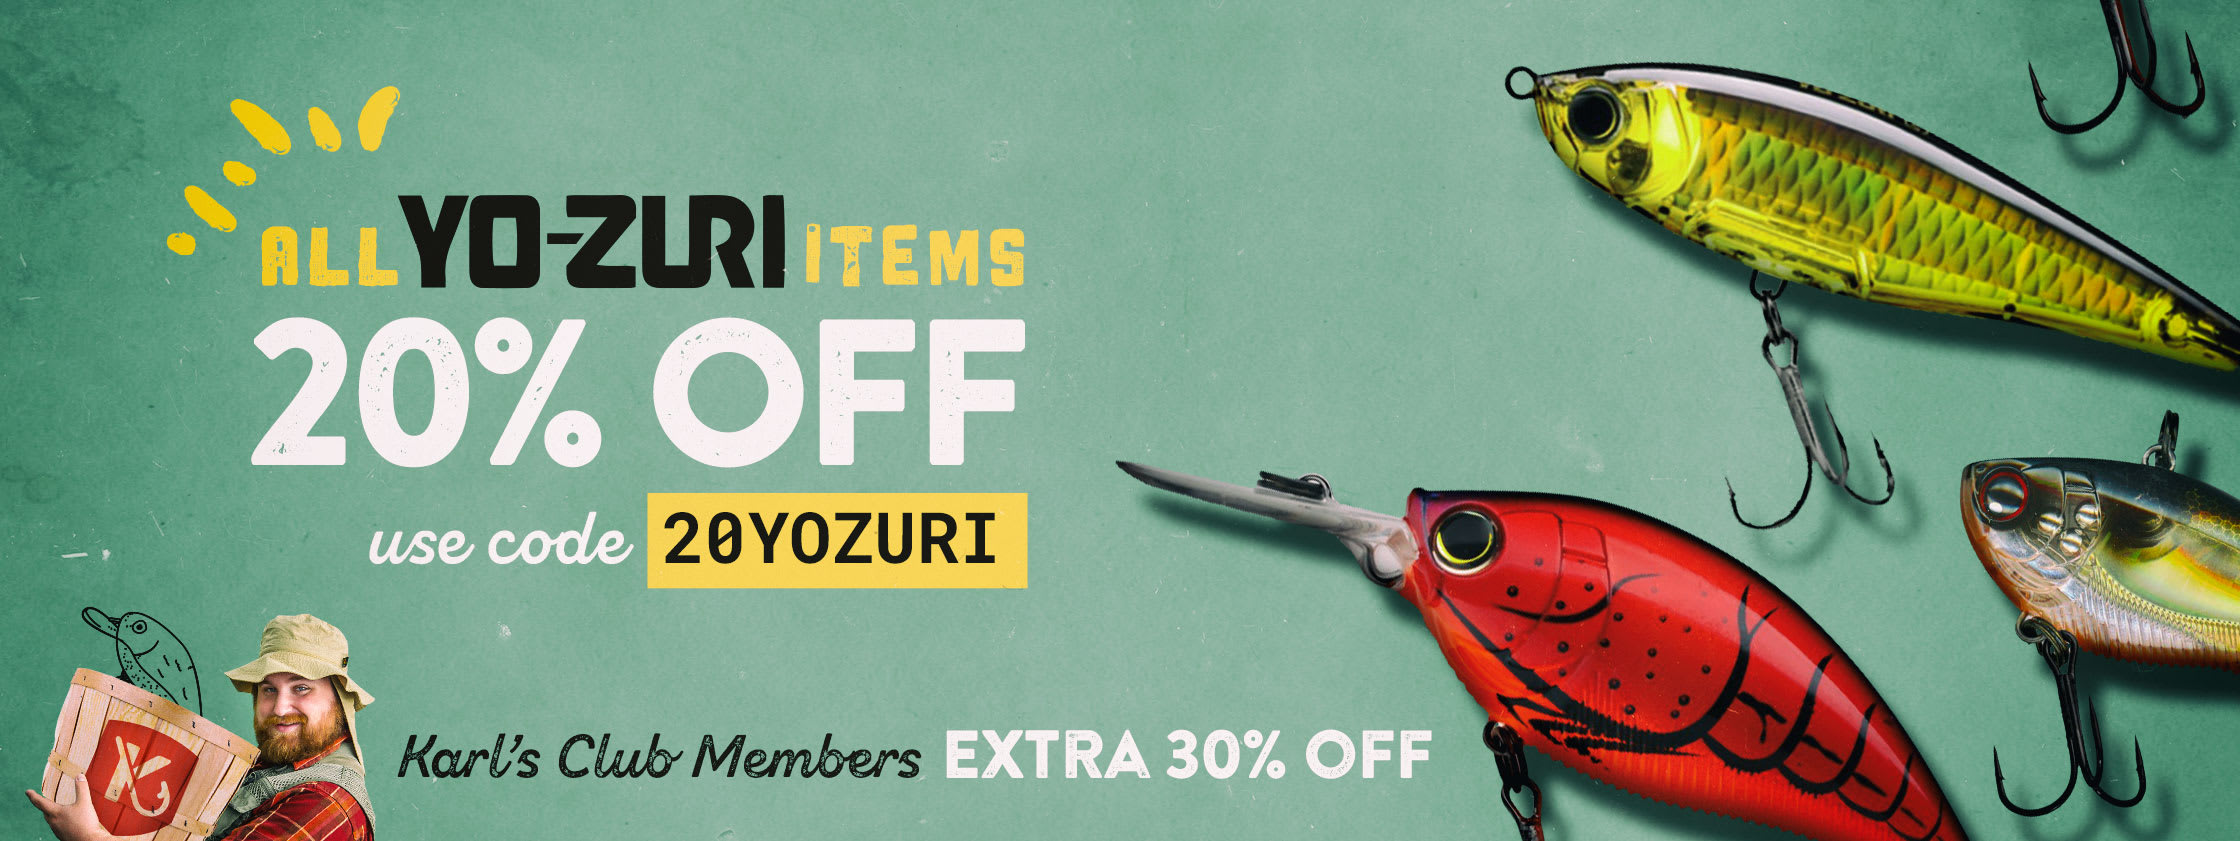 20% off YoZuri Items